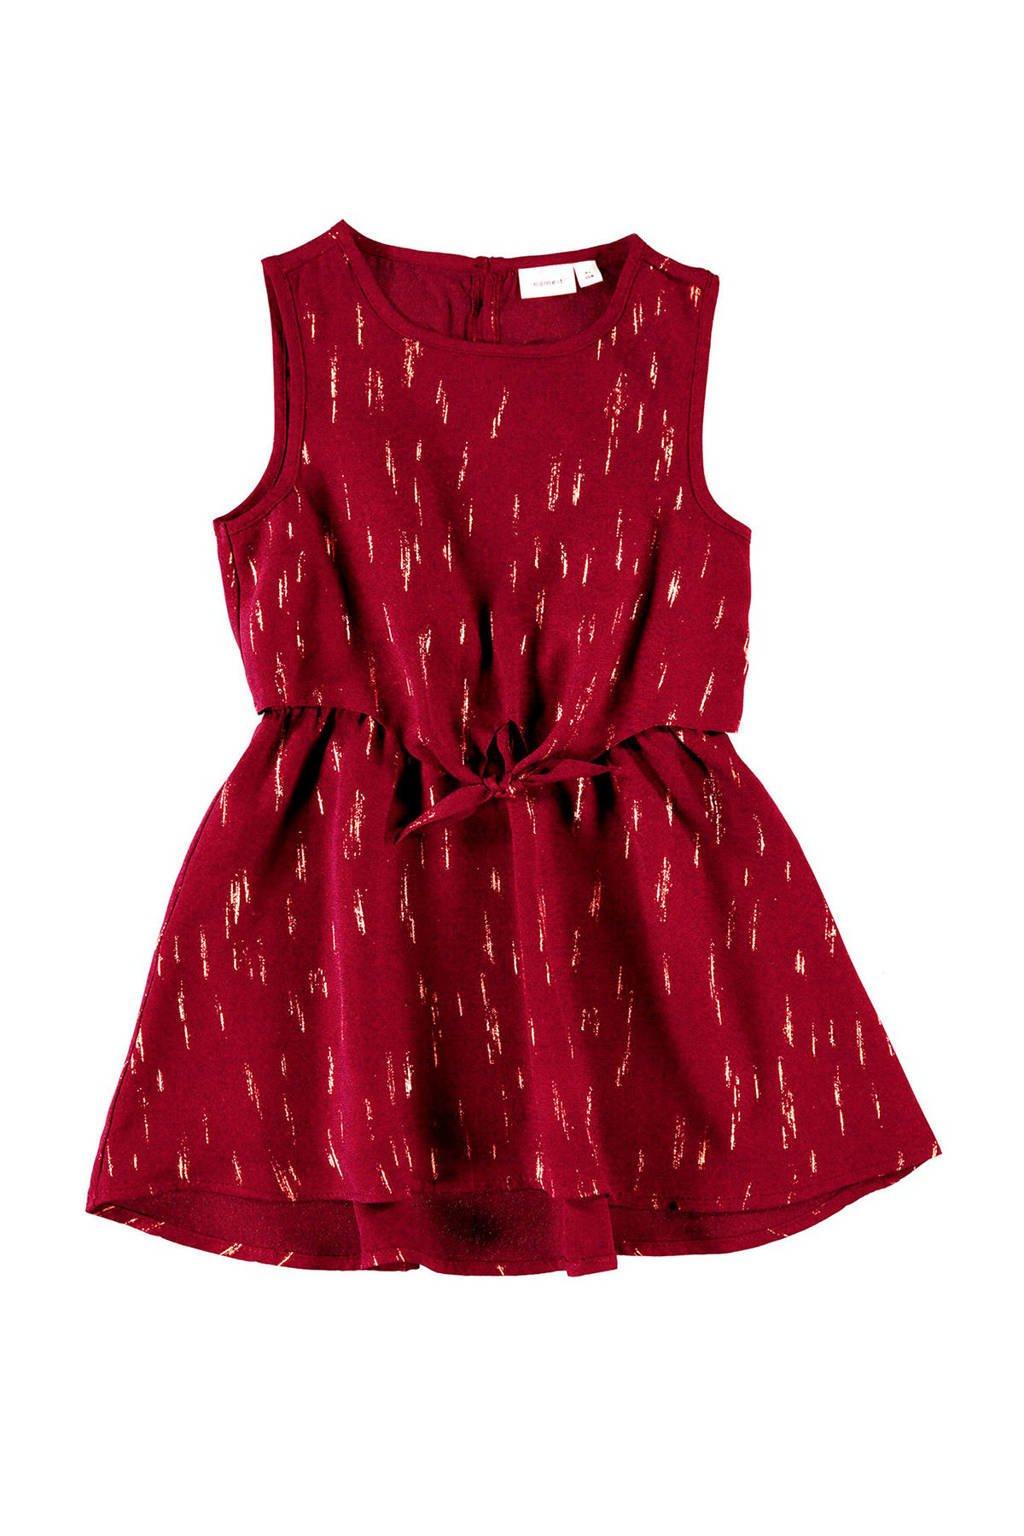 NAME IT MINI jurk met all over print donkerrood/goud, Donkerrood/goud